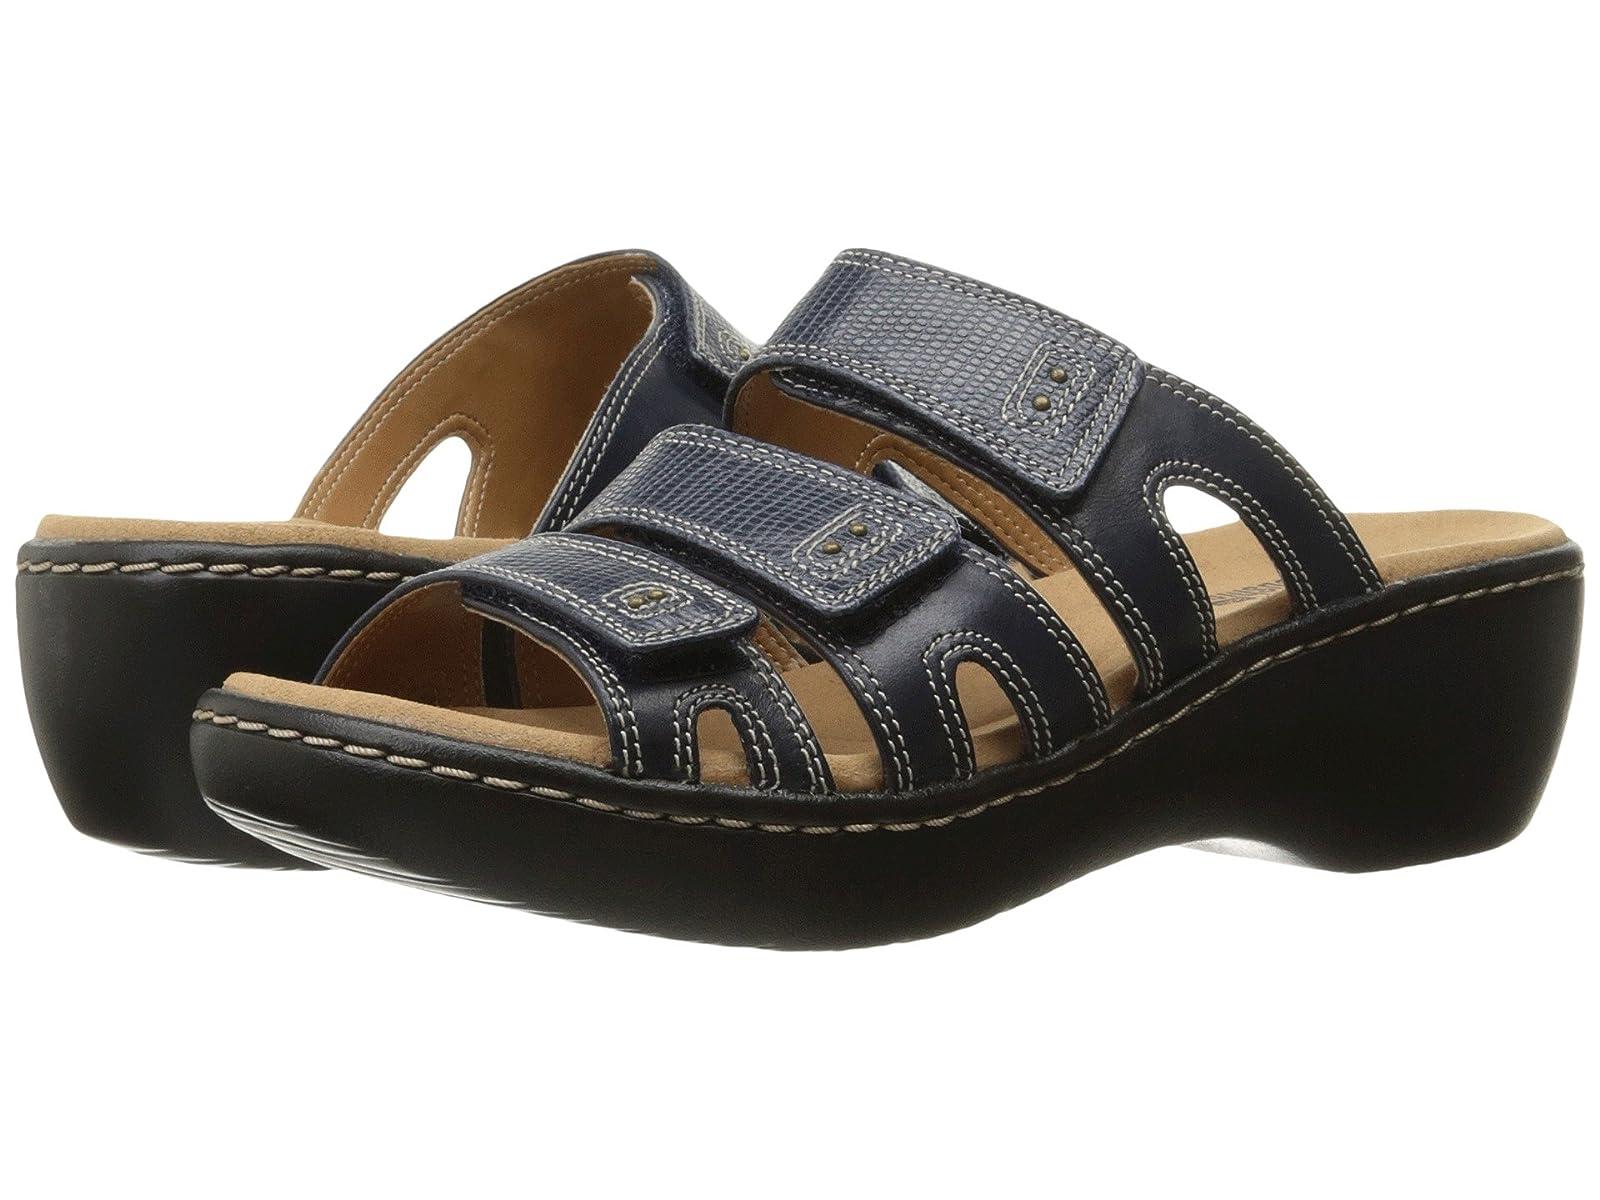 Clarks Delana DamirCheap and distinctive eye-catching shoes